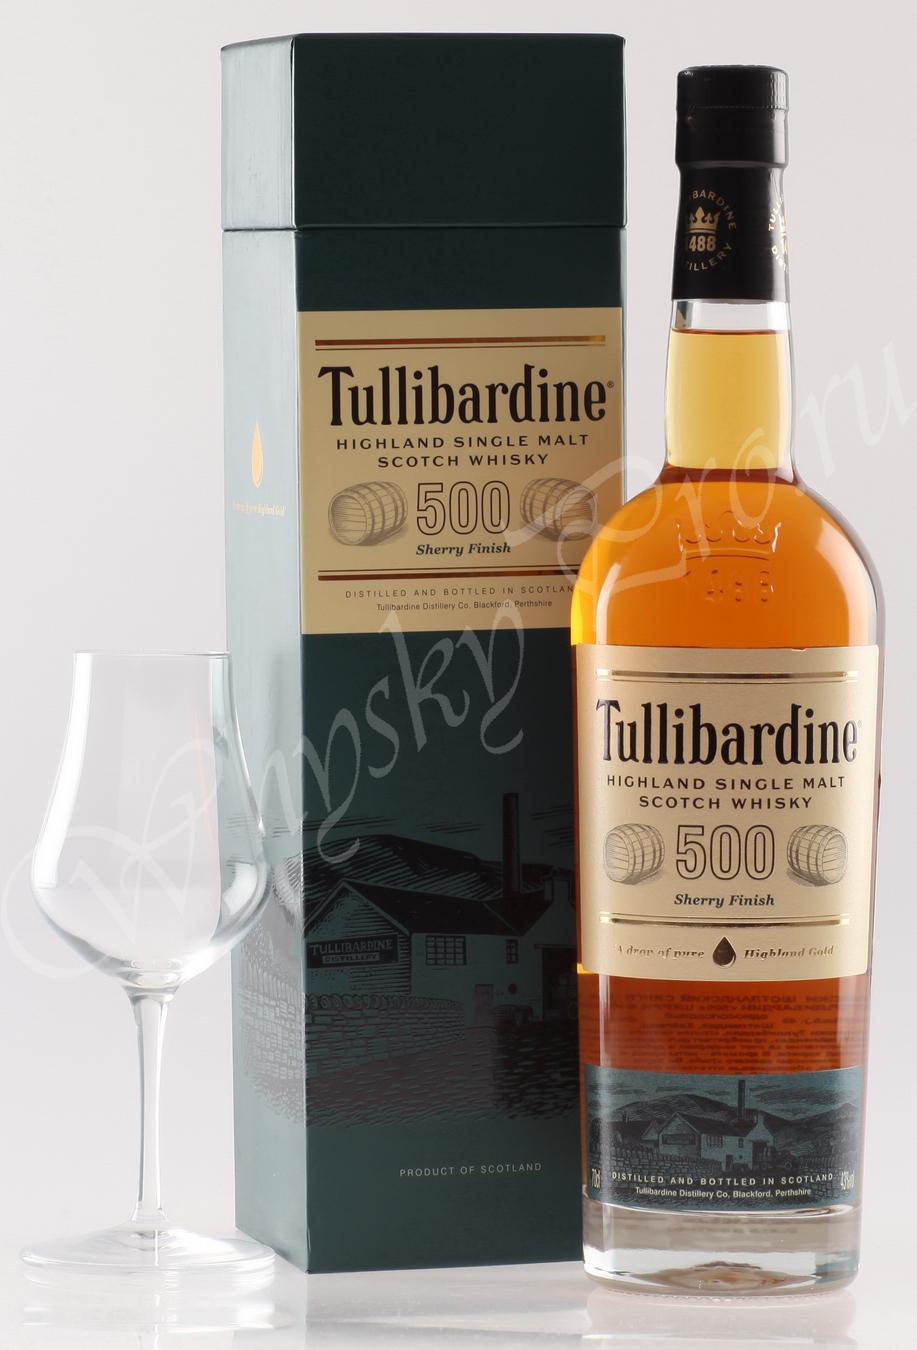 Виски Шотландский виски Тулибардин 500 виски Tullibardine 500